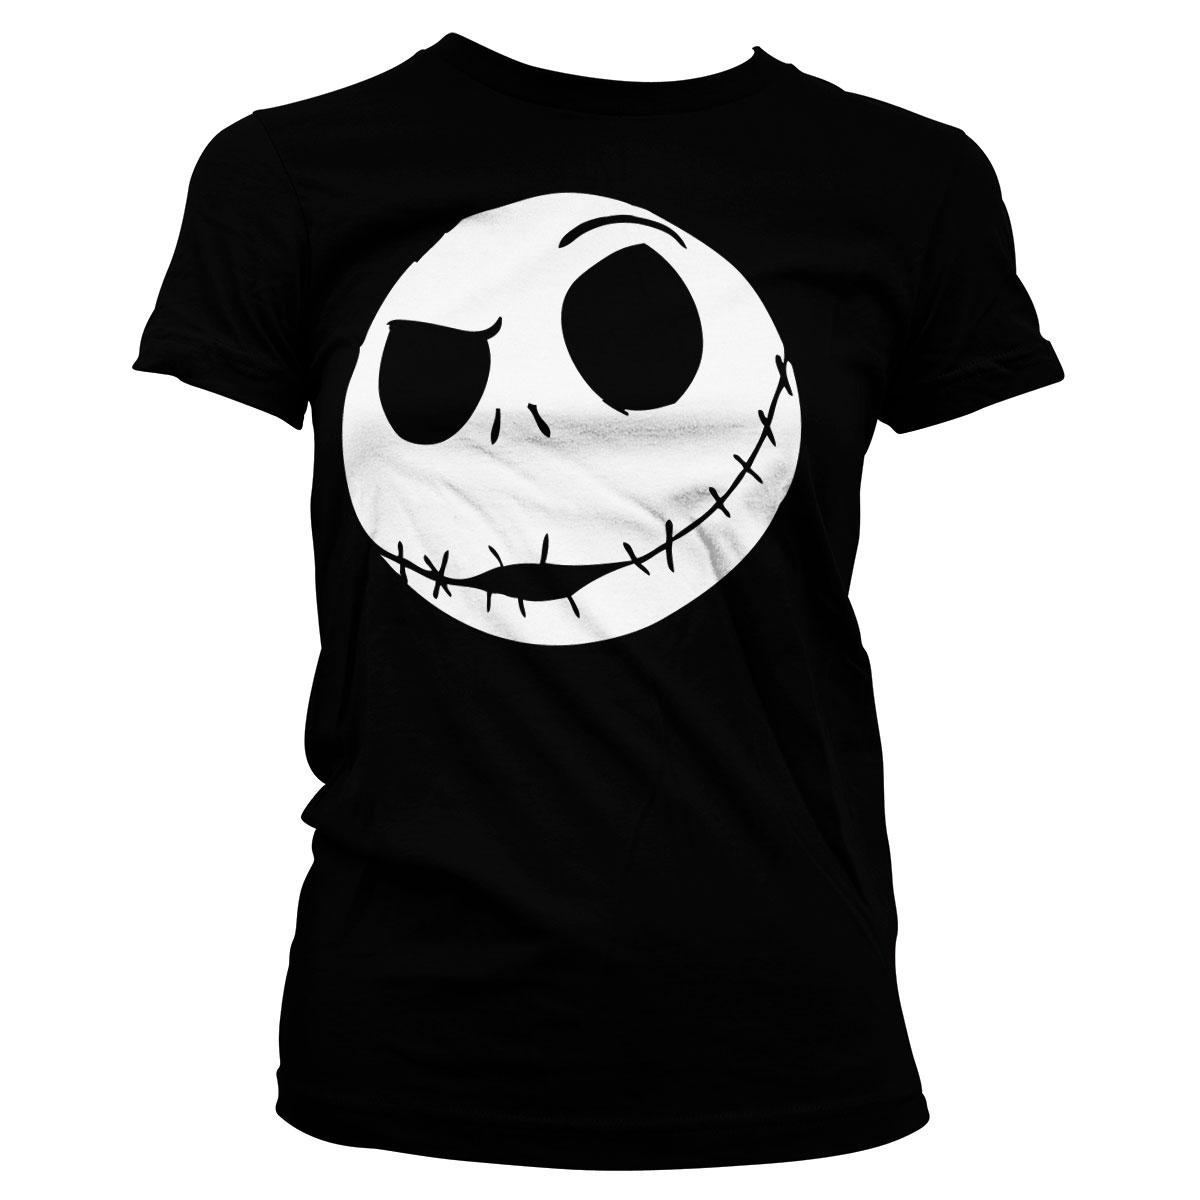 the-nightmare-before-christmas-jack-skellington-women-t-shirt